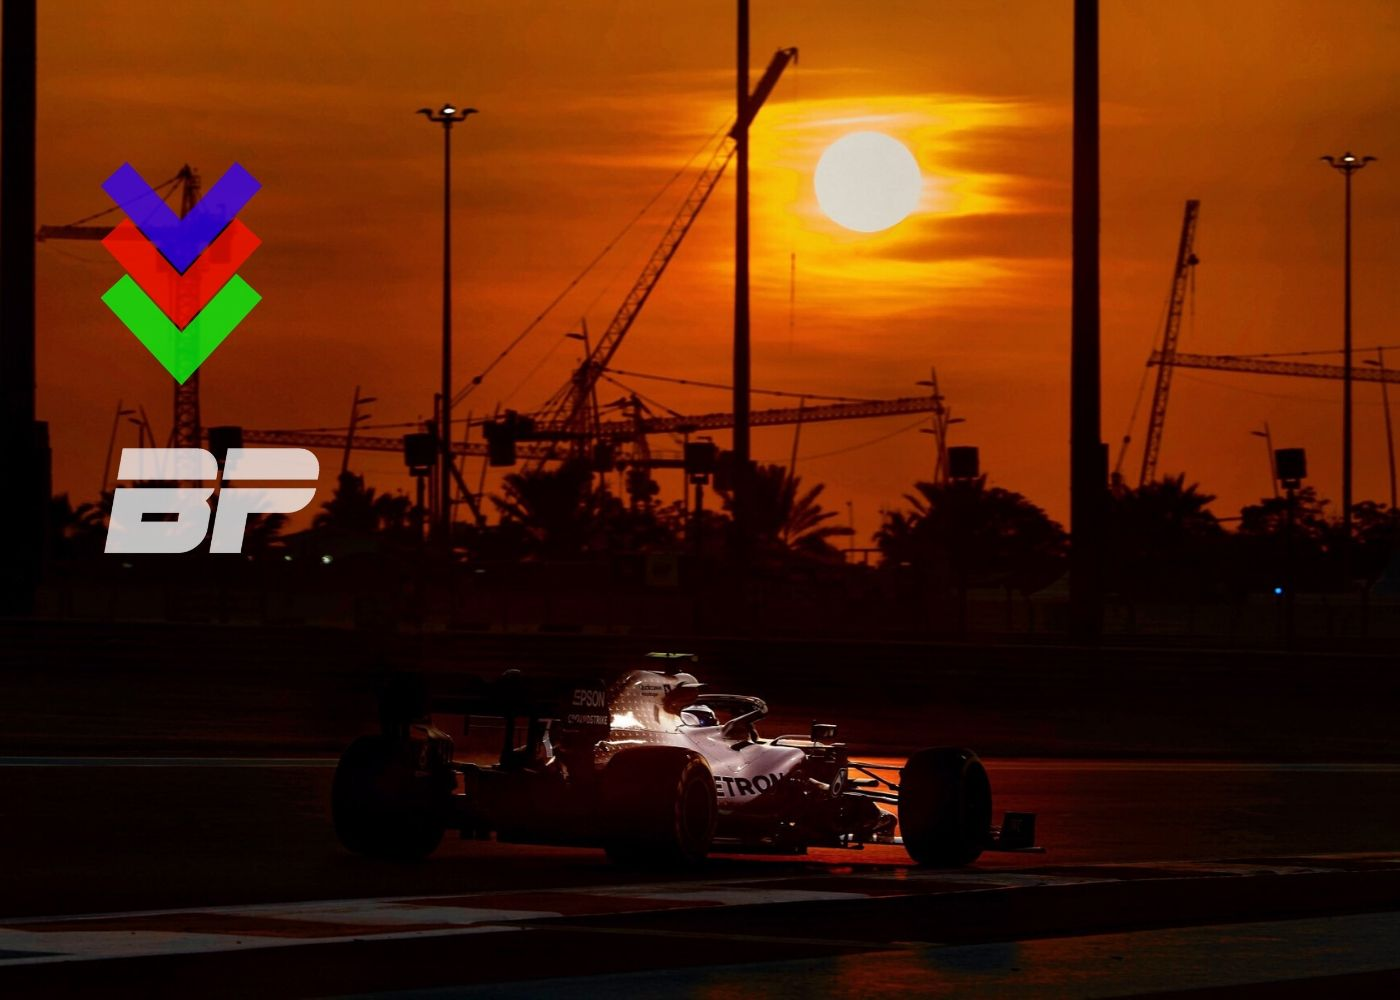 Foto de TL2 Abu Dhabi – Valtteri Bottas encerra sexta-feira na liderança, mas se envolve em incidente com Grosjean